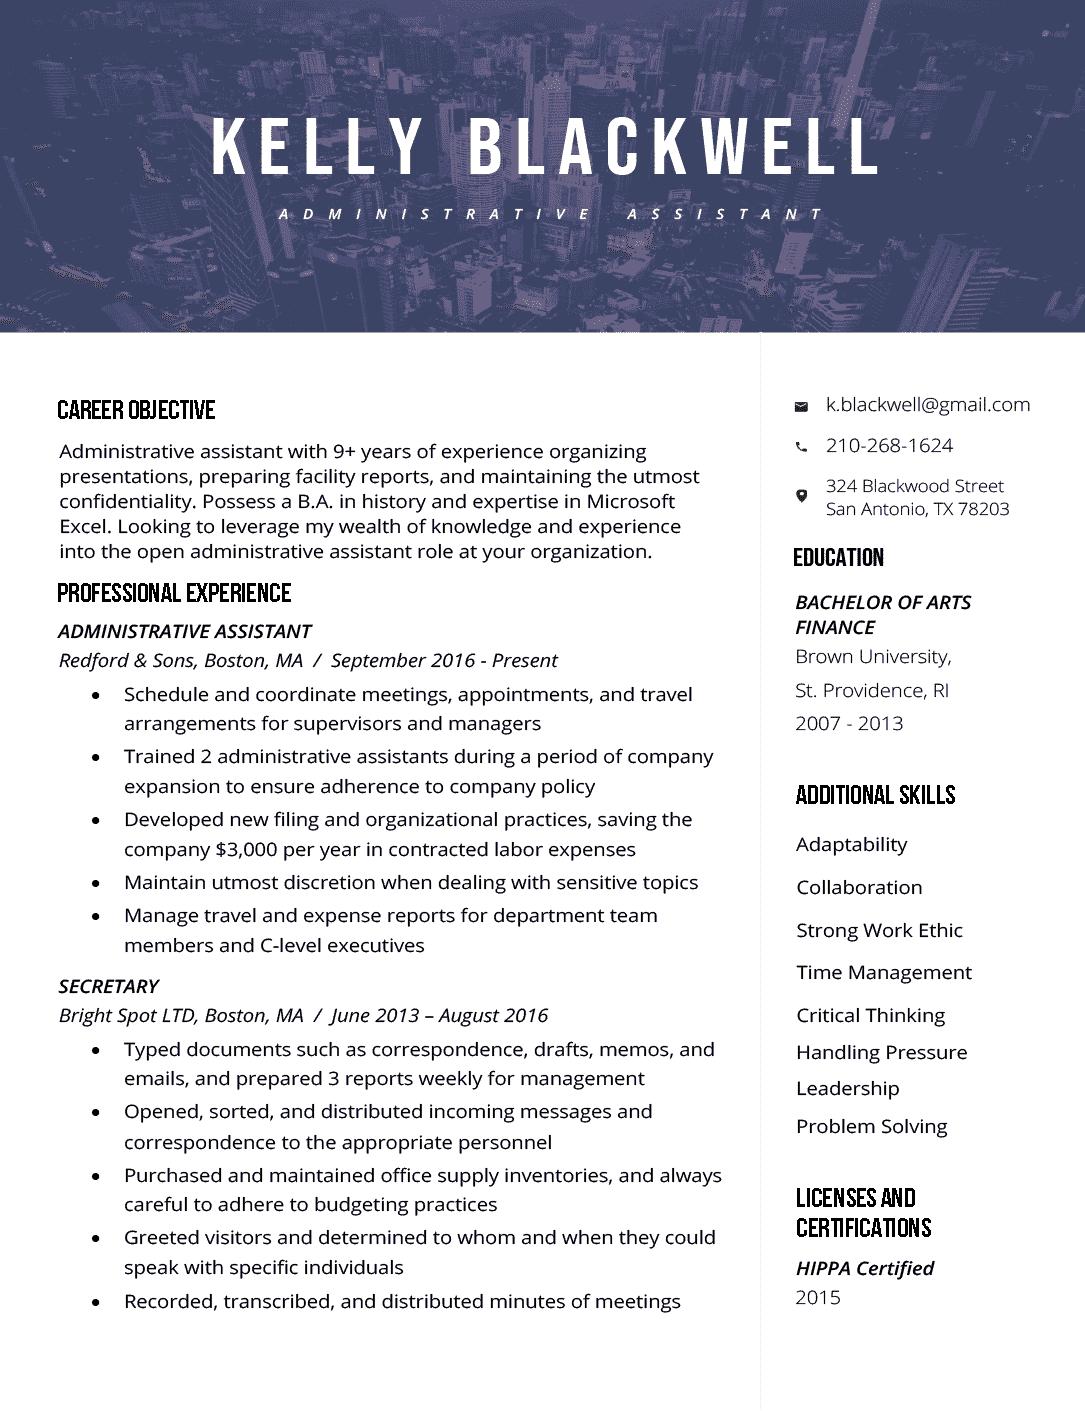 Resume Builder Resume templates, Web developer resume